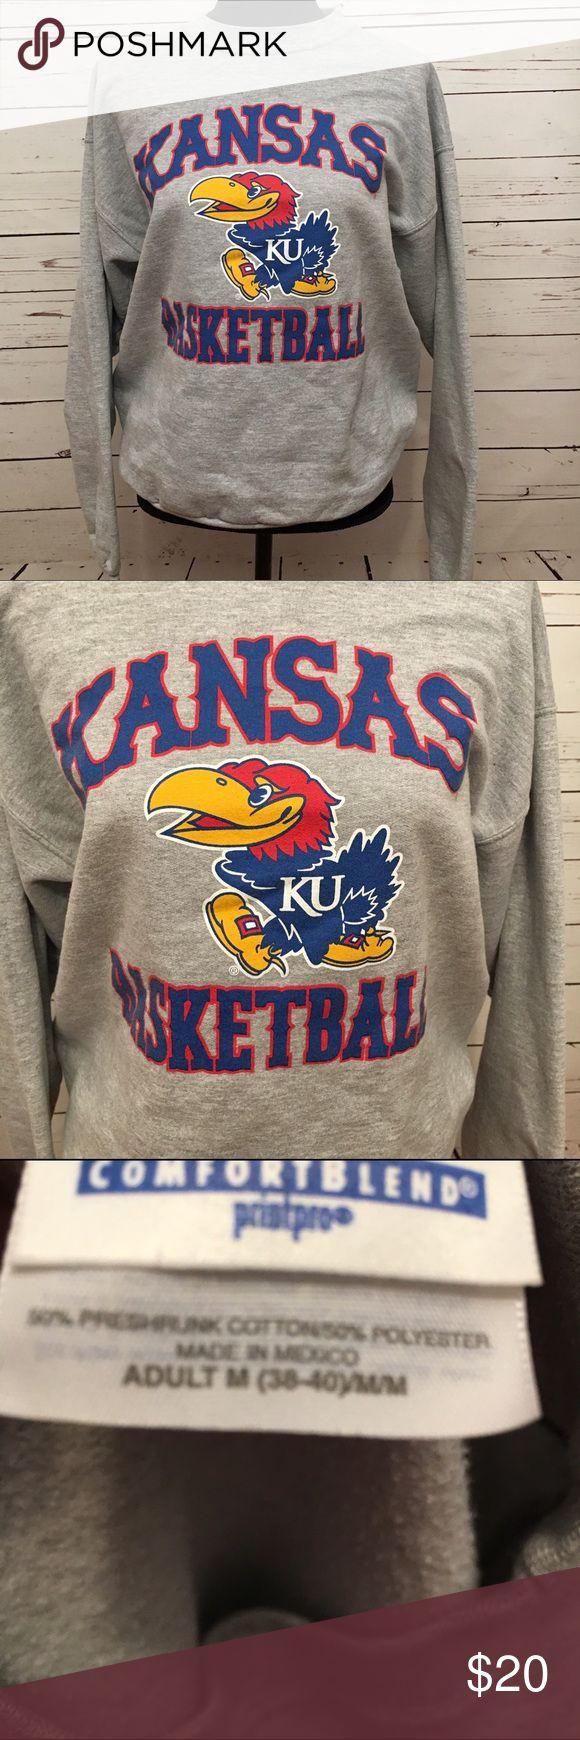 Kansas university basketball sweatshirt medium Kansas university medium basketball sweatshirt in good used condition. Super soft. 22 arm to arm and 26 shoulder to hem. basketball Tops Sweatshirts & Hoodies